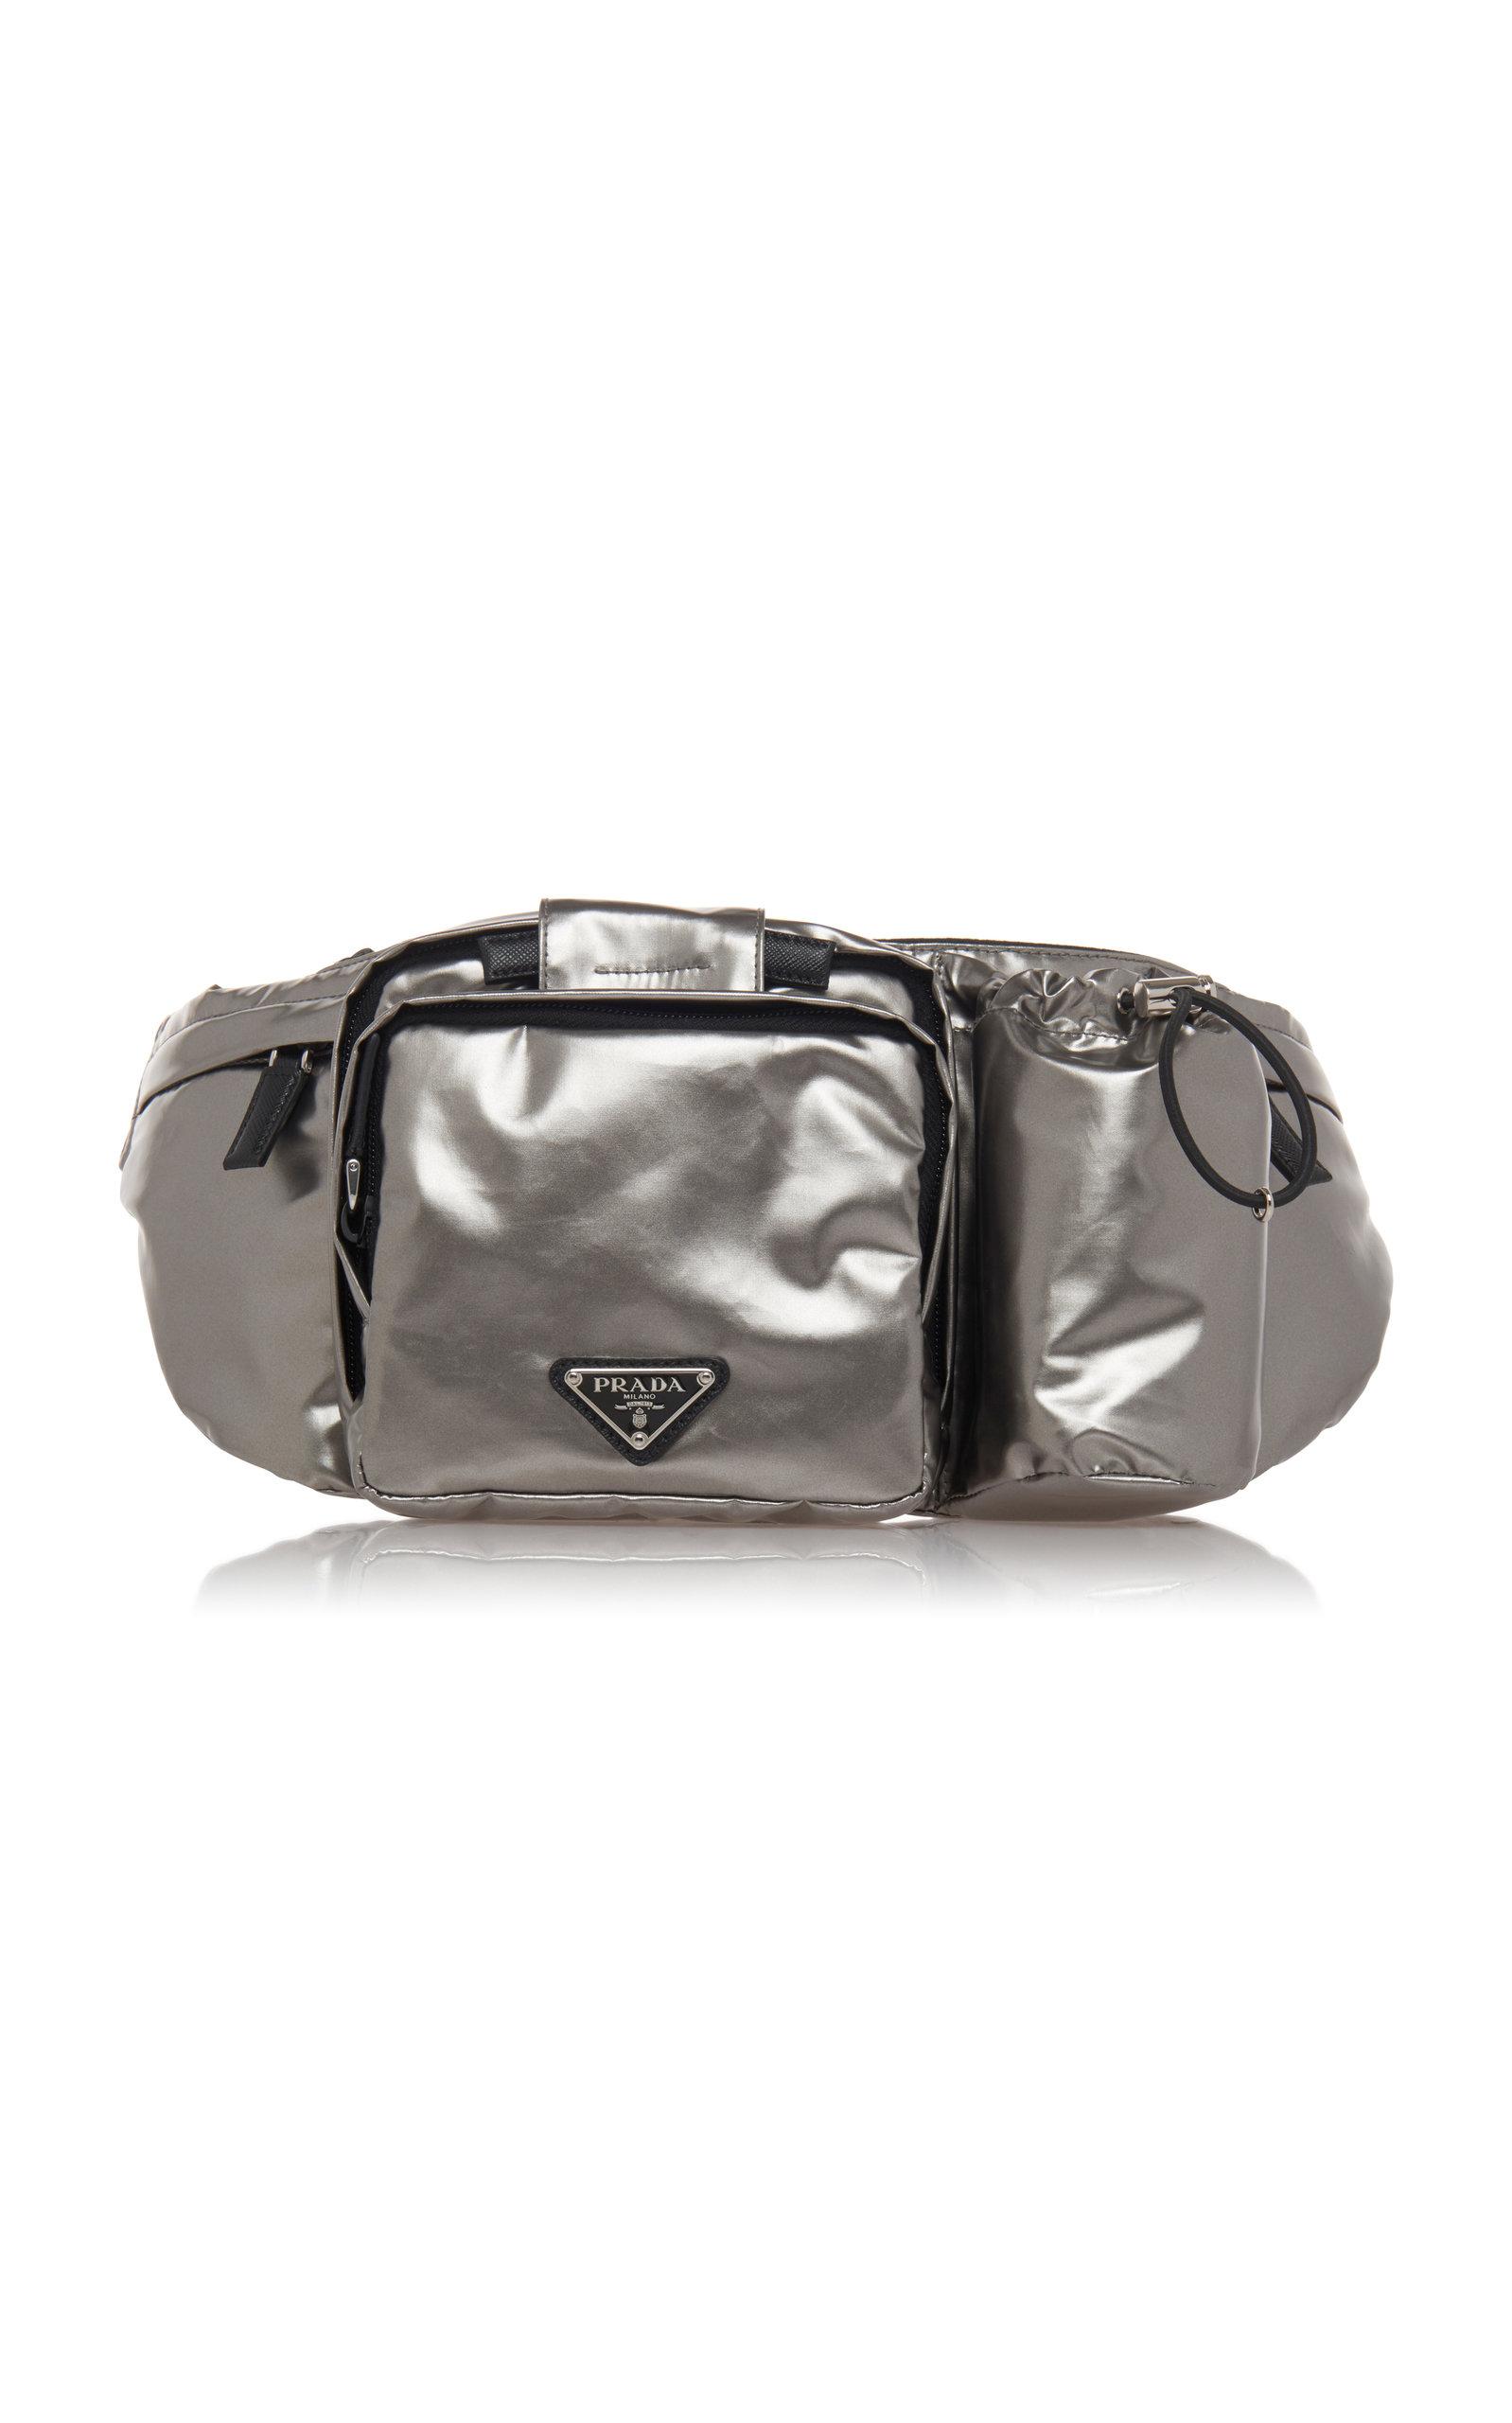 Prada Silver Nylon Hip Bag With Water Bottle Holder In Grey